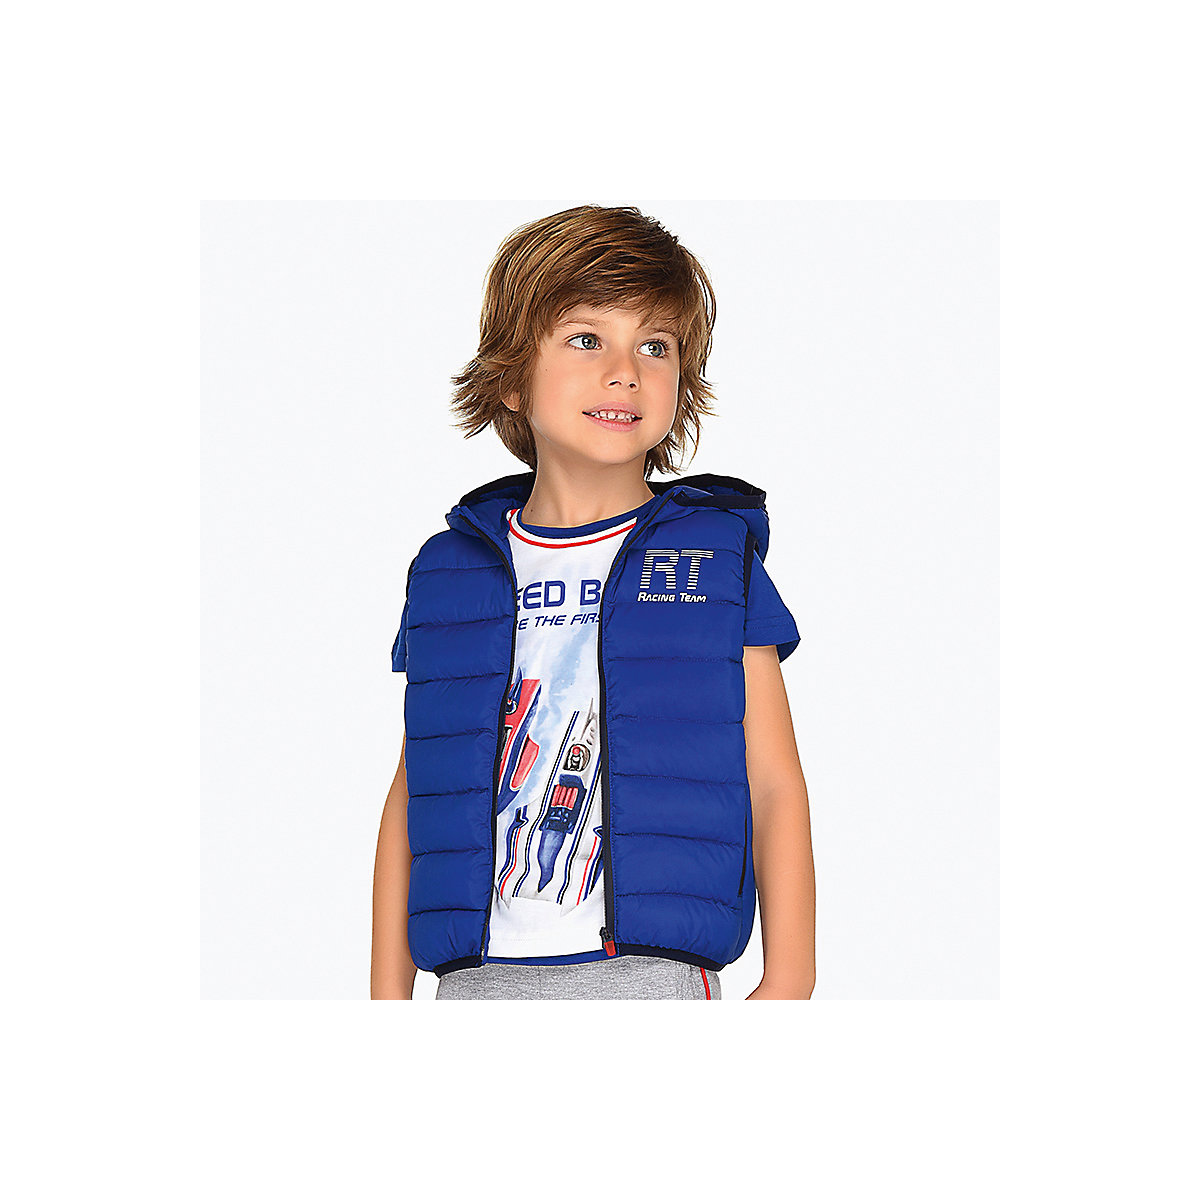 Vests & Waistcoats MAYORAL 10691254 Vest kids for boys Children s Clothing Comfortable and stylish stylish rhinestone heart round letter bracelet for women